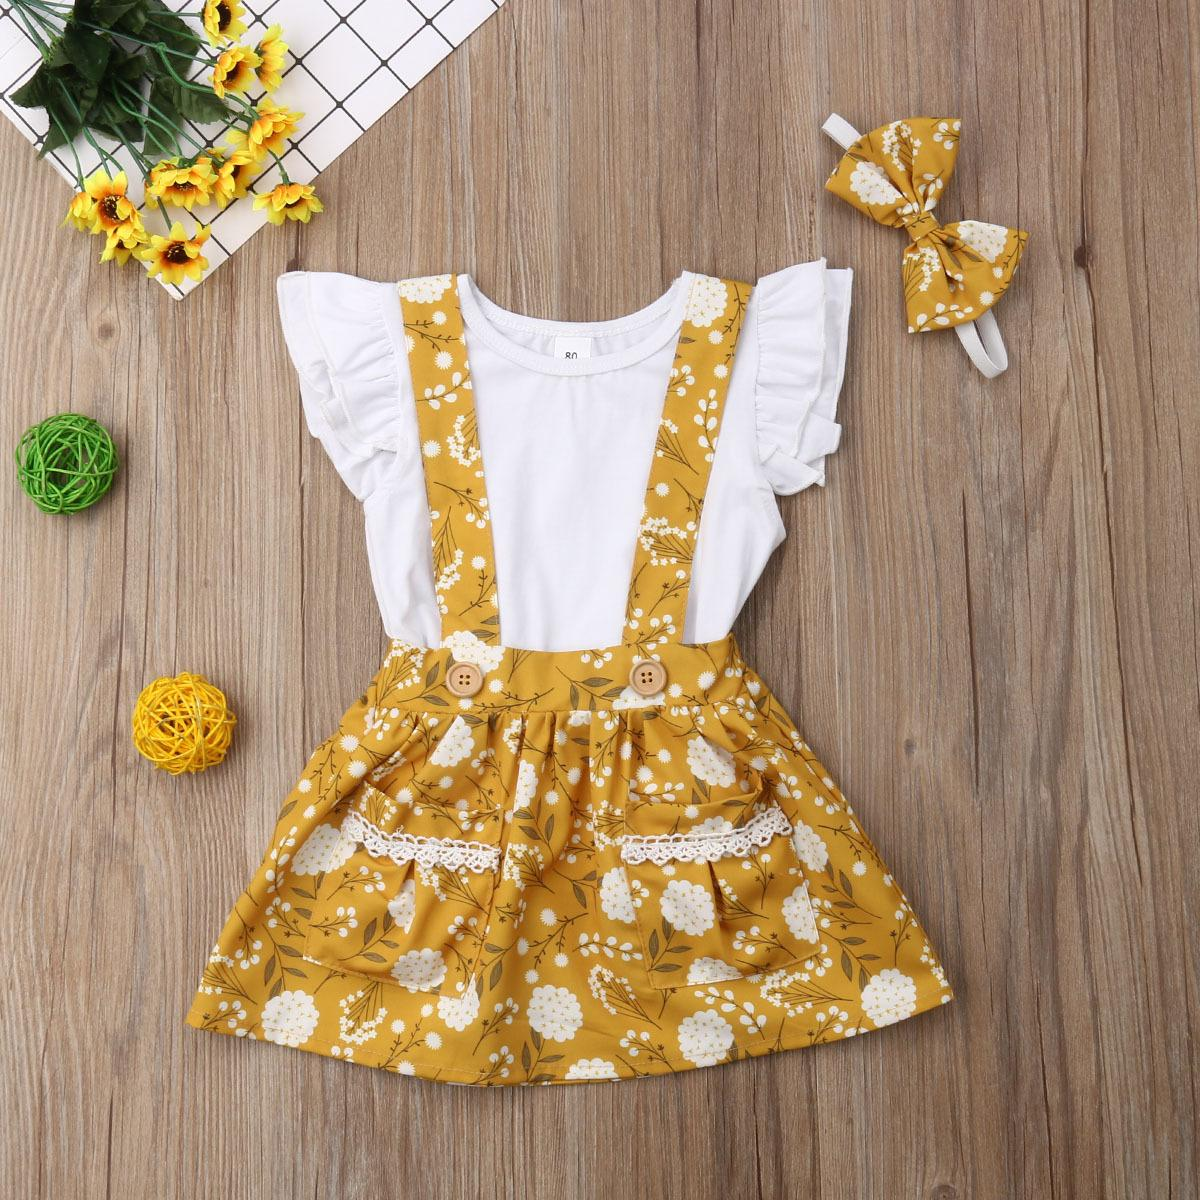 Kids Cute Princess Dress Baby Party 3D Cartoon Girls Toddler Skirt Costume 2pcs